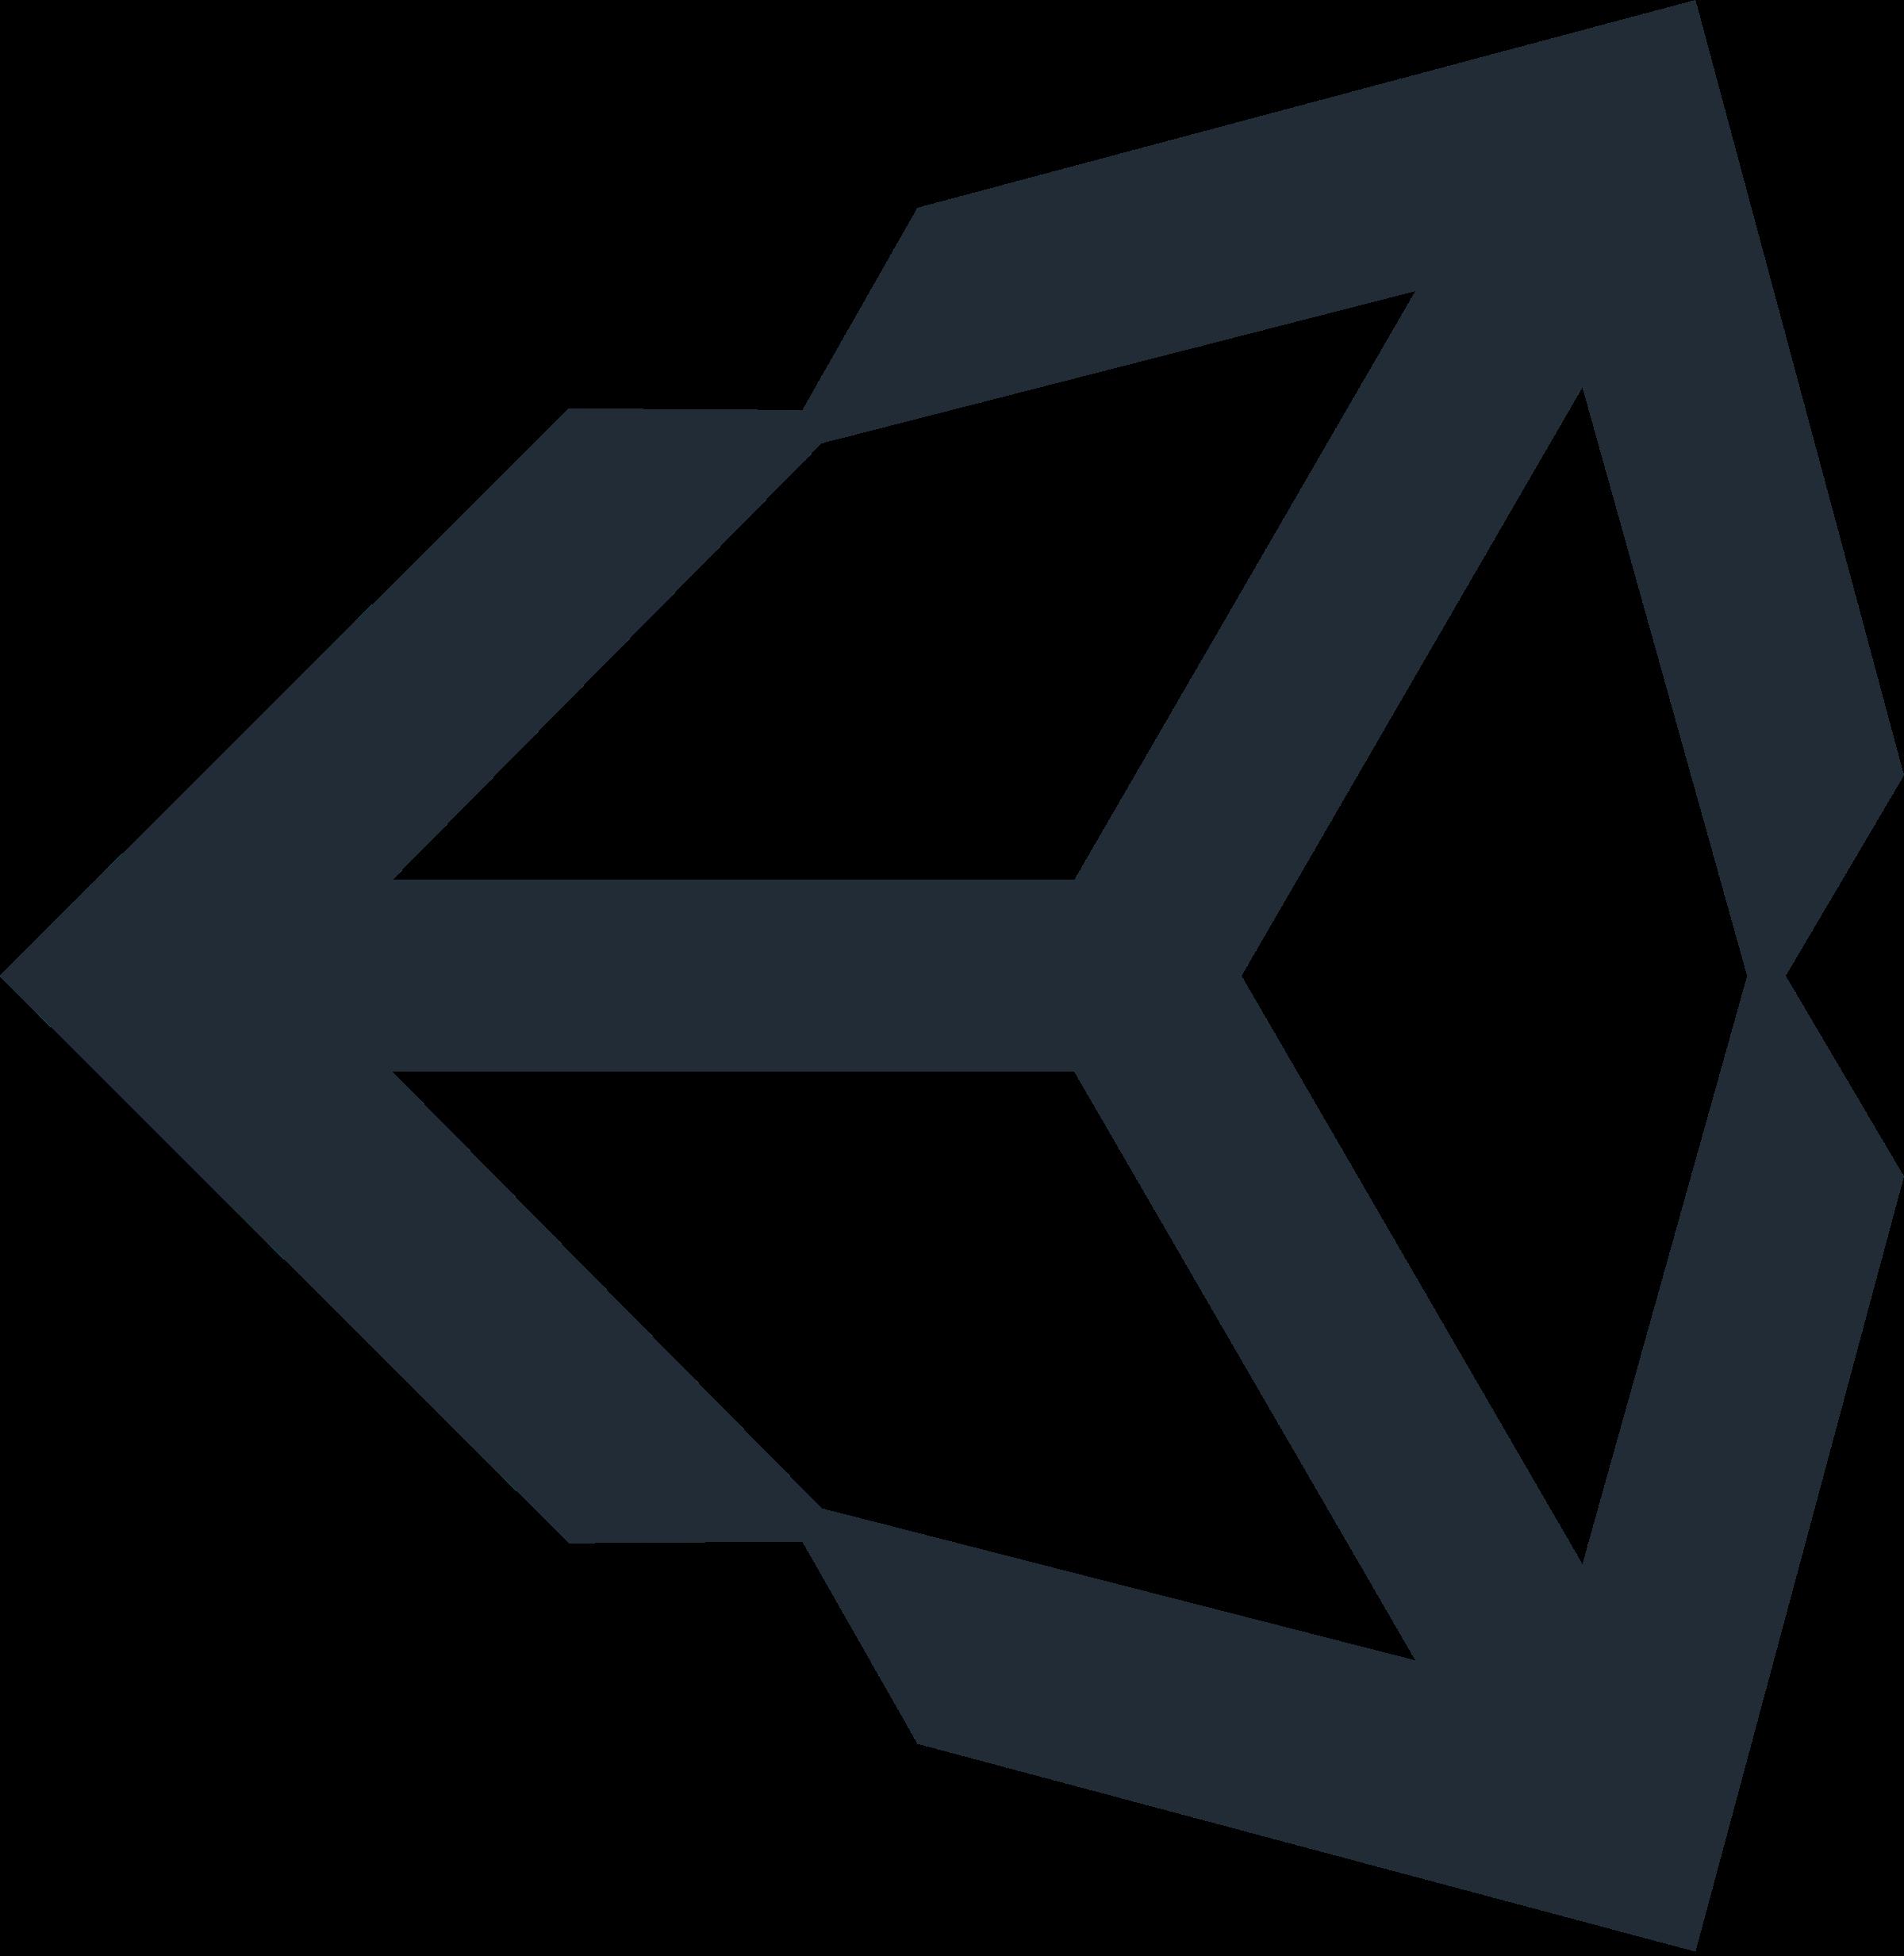 Unity Logo PNG Transparent & SVG Vector.